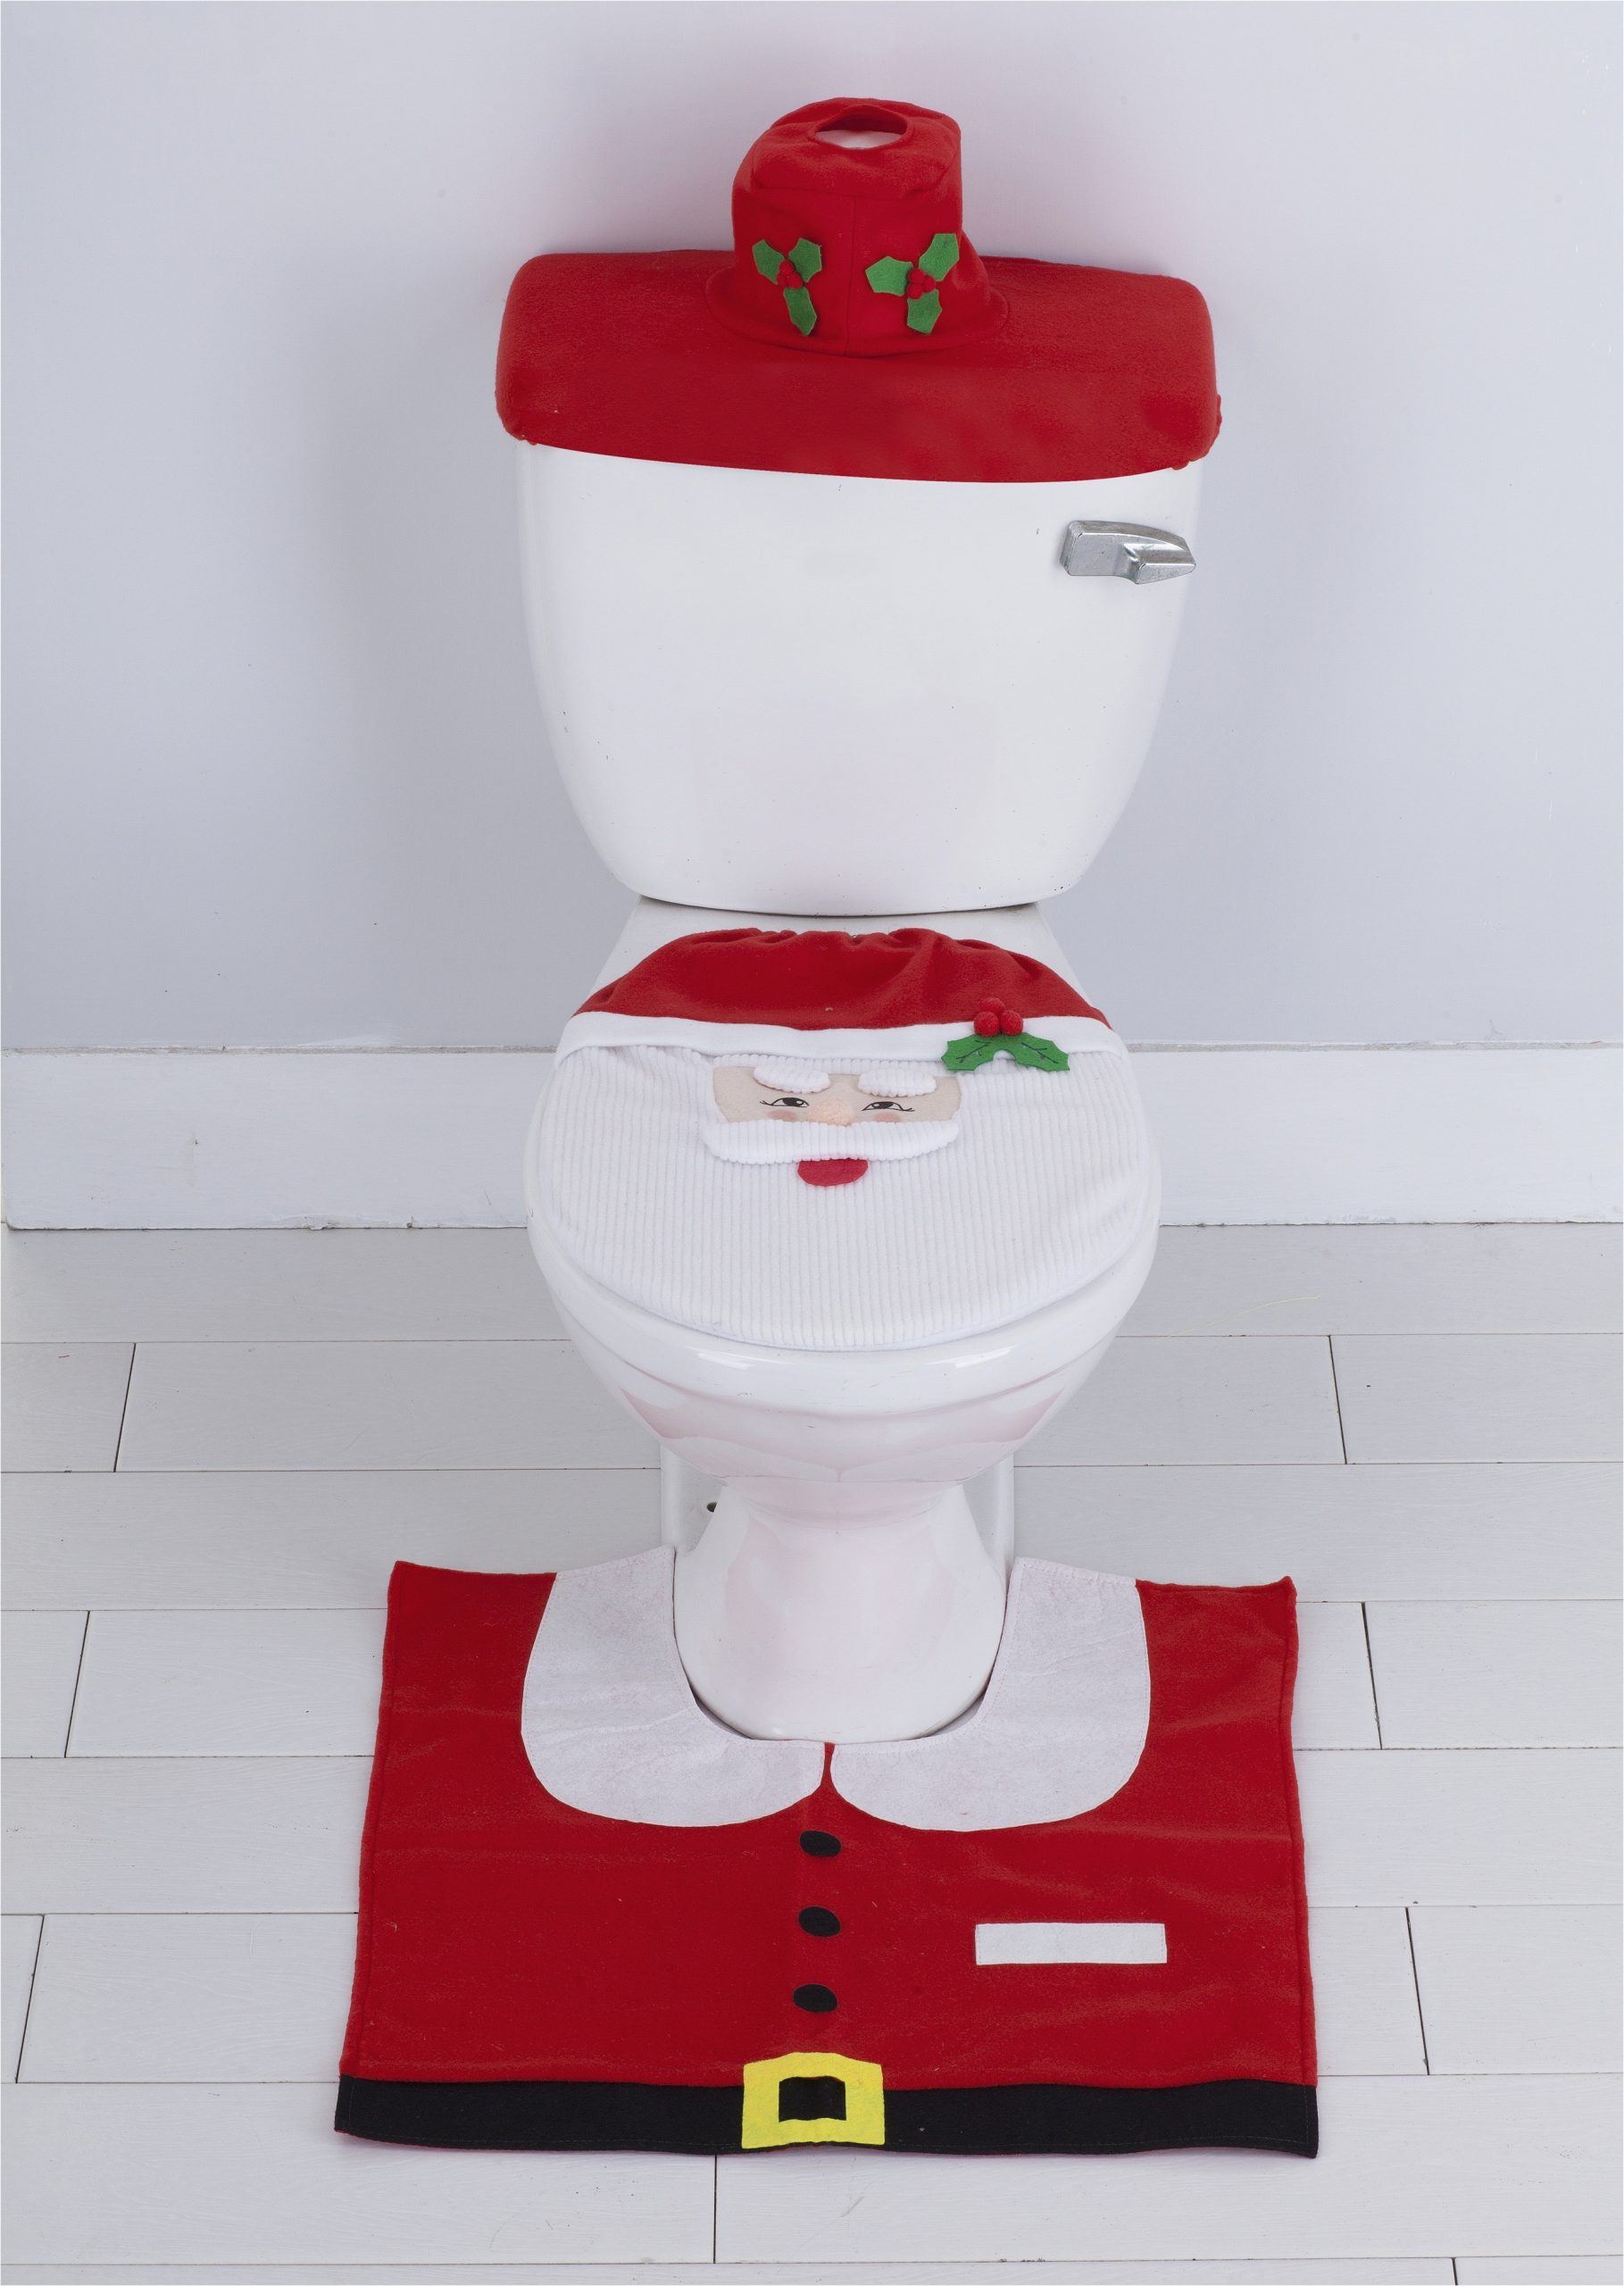 Holiday Bath Rug Set Festivebath by Benjonah 3 Piece Decorative Holiday Bath Rug Set Santa Claus Walmart Com